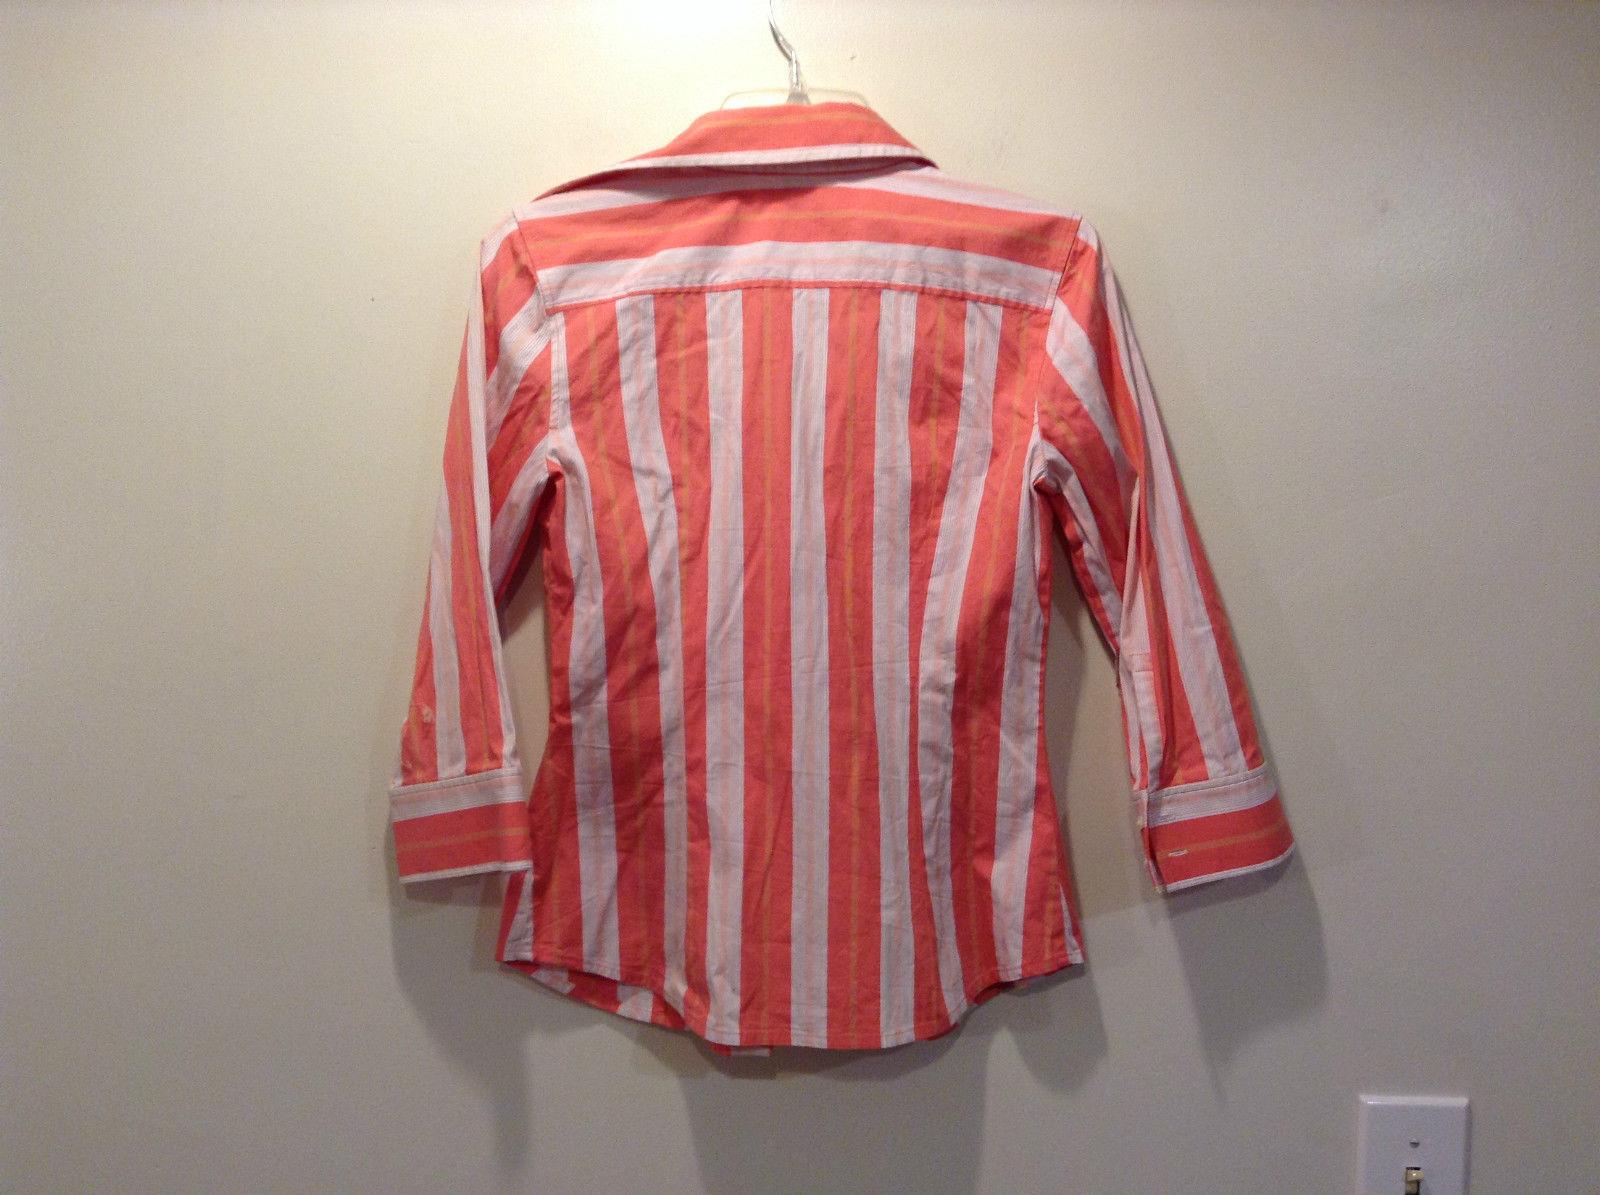 Express Design Studio Orange Pink Down Striped Shirt Size Small Button on Cuffs